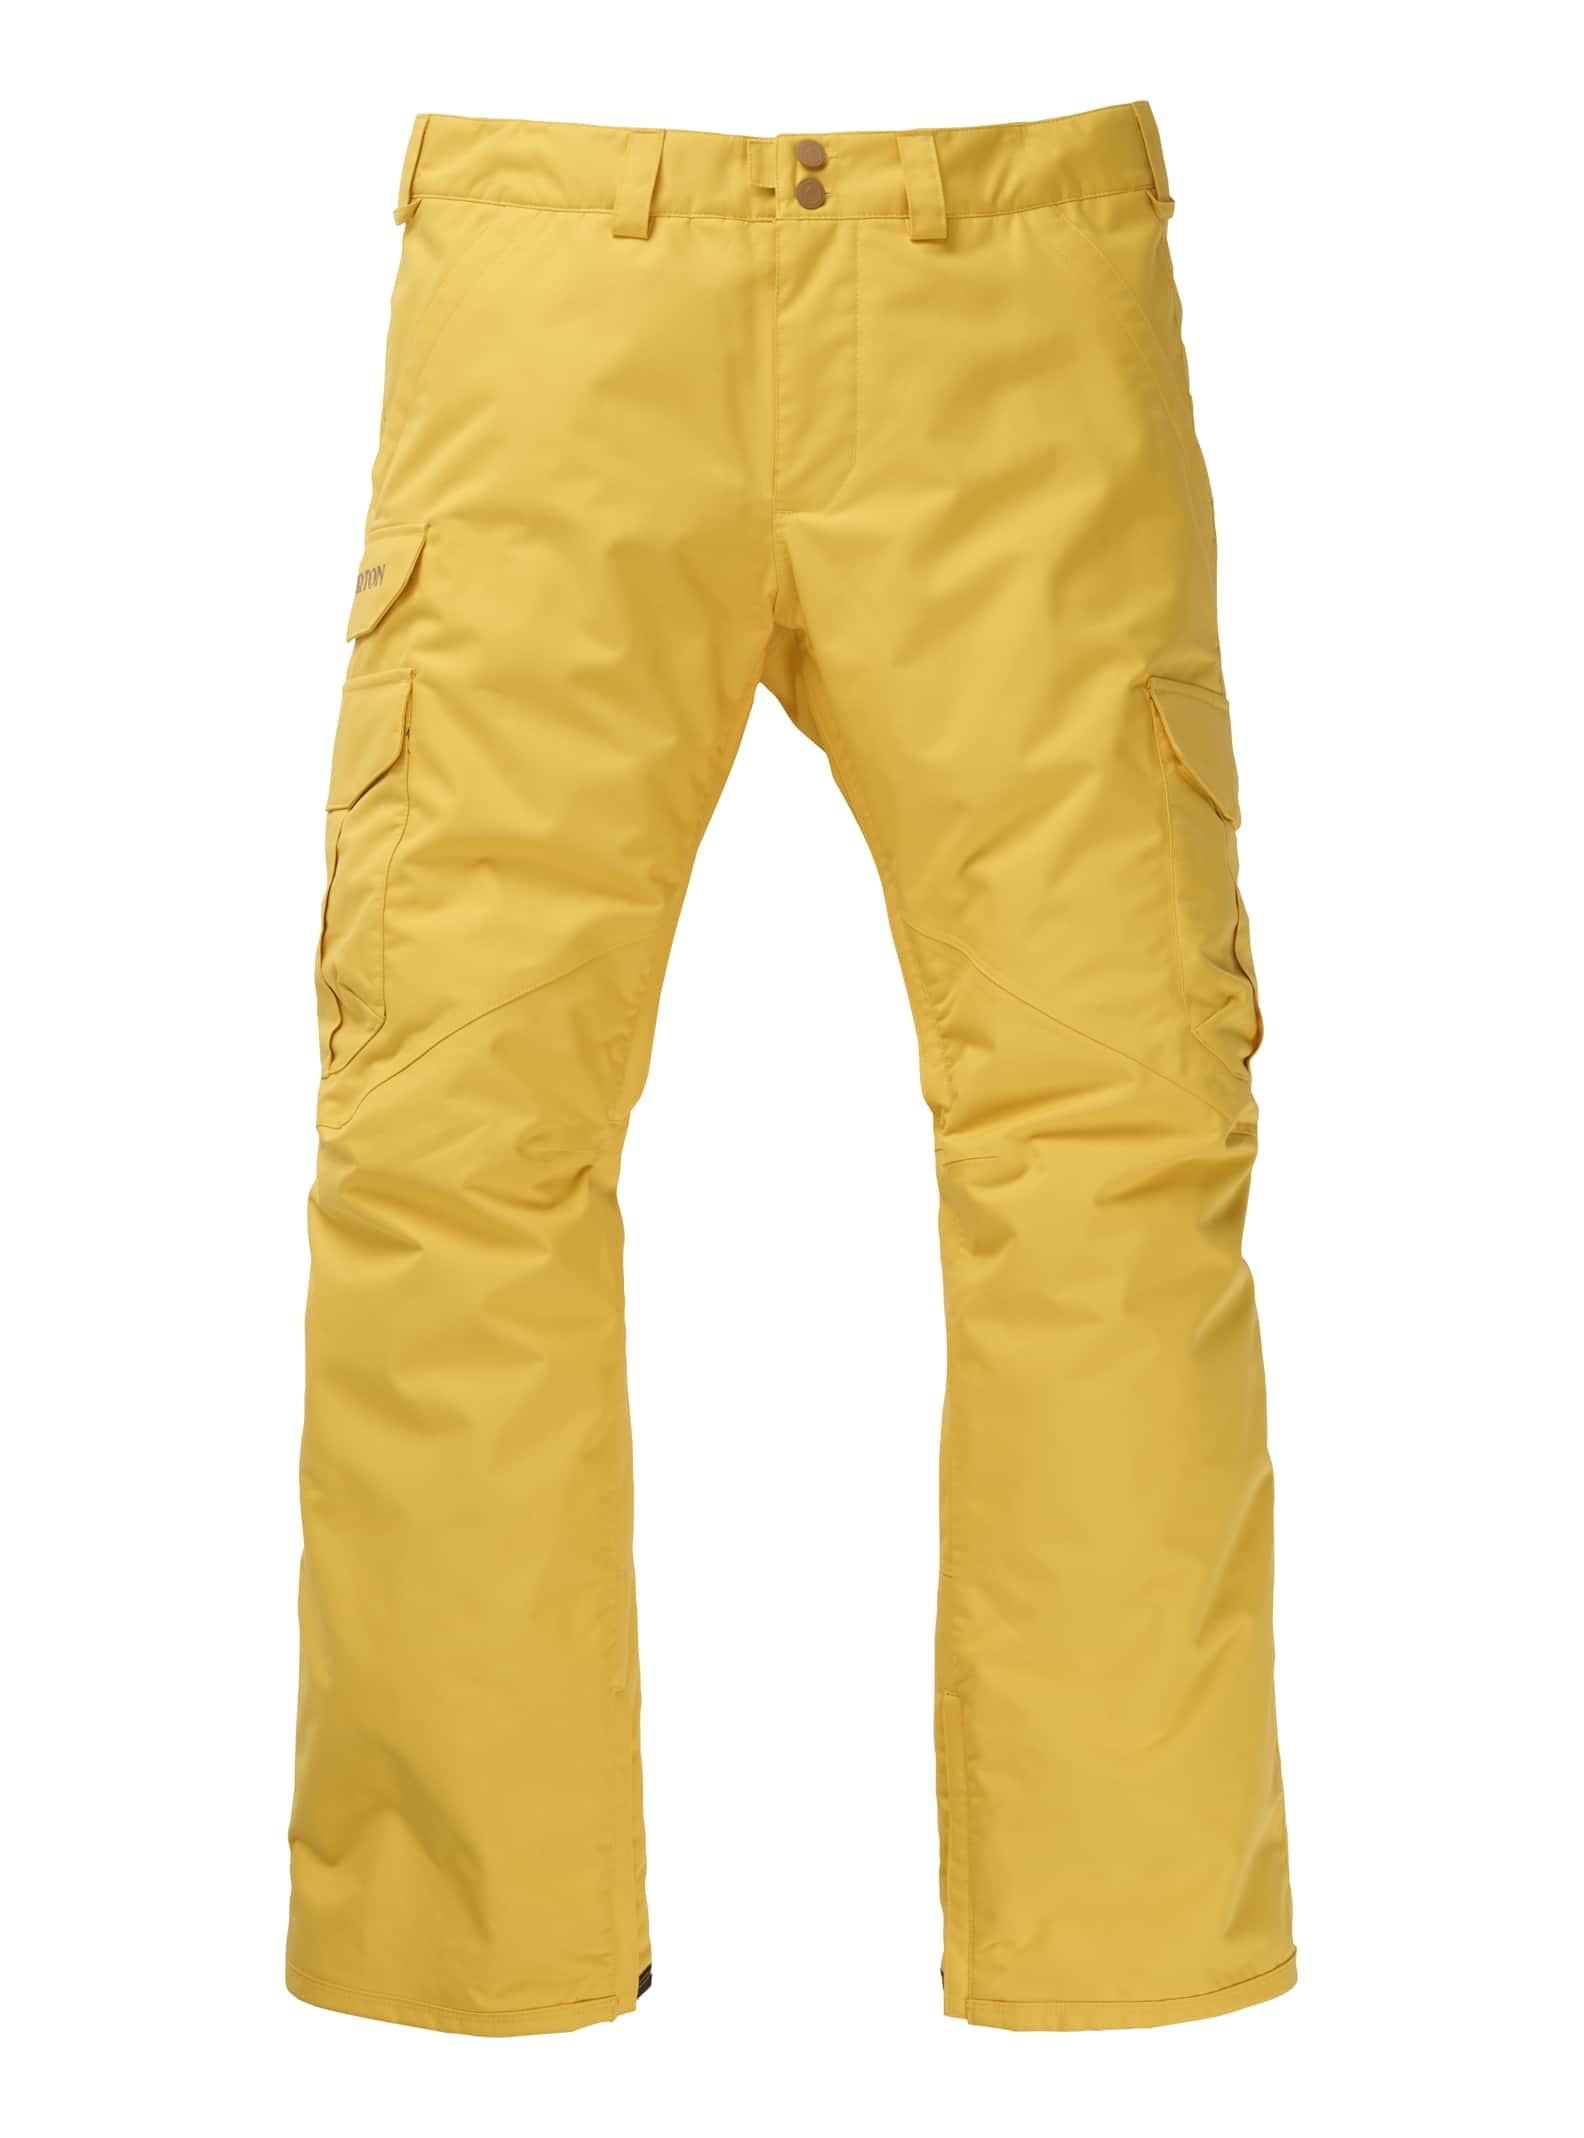 Medium Yellow Burton Cargo Regular Fit Pants 2020